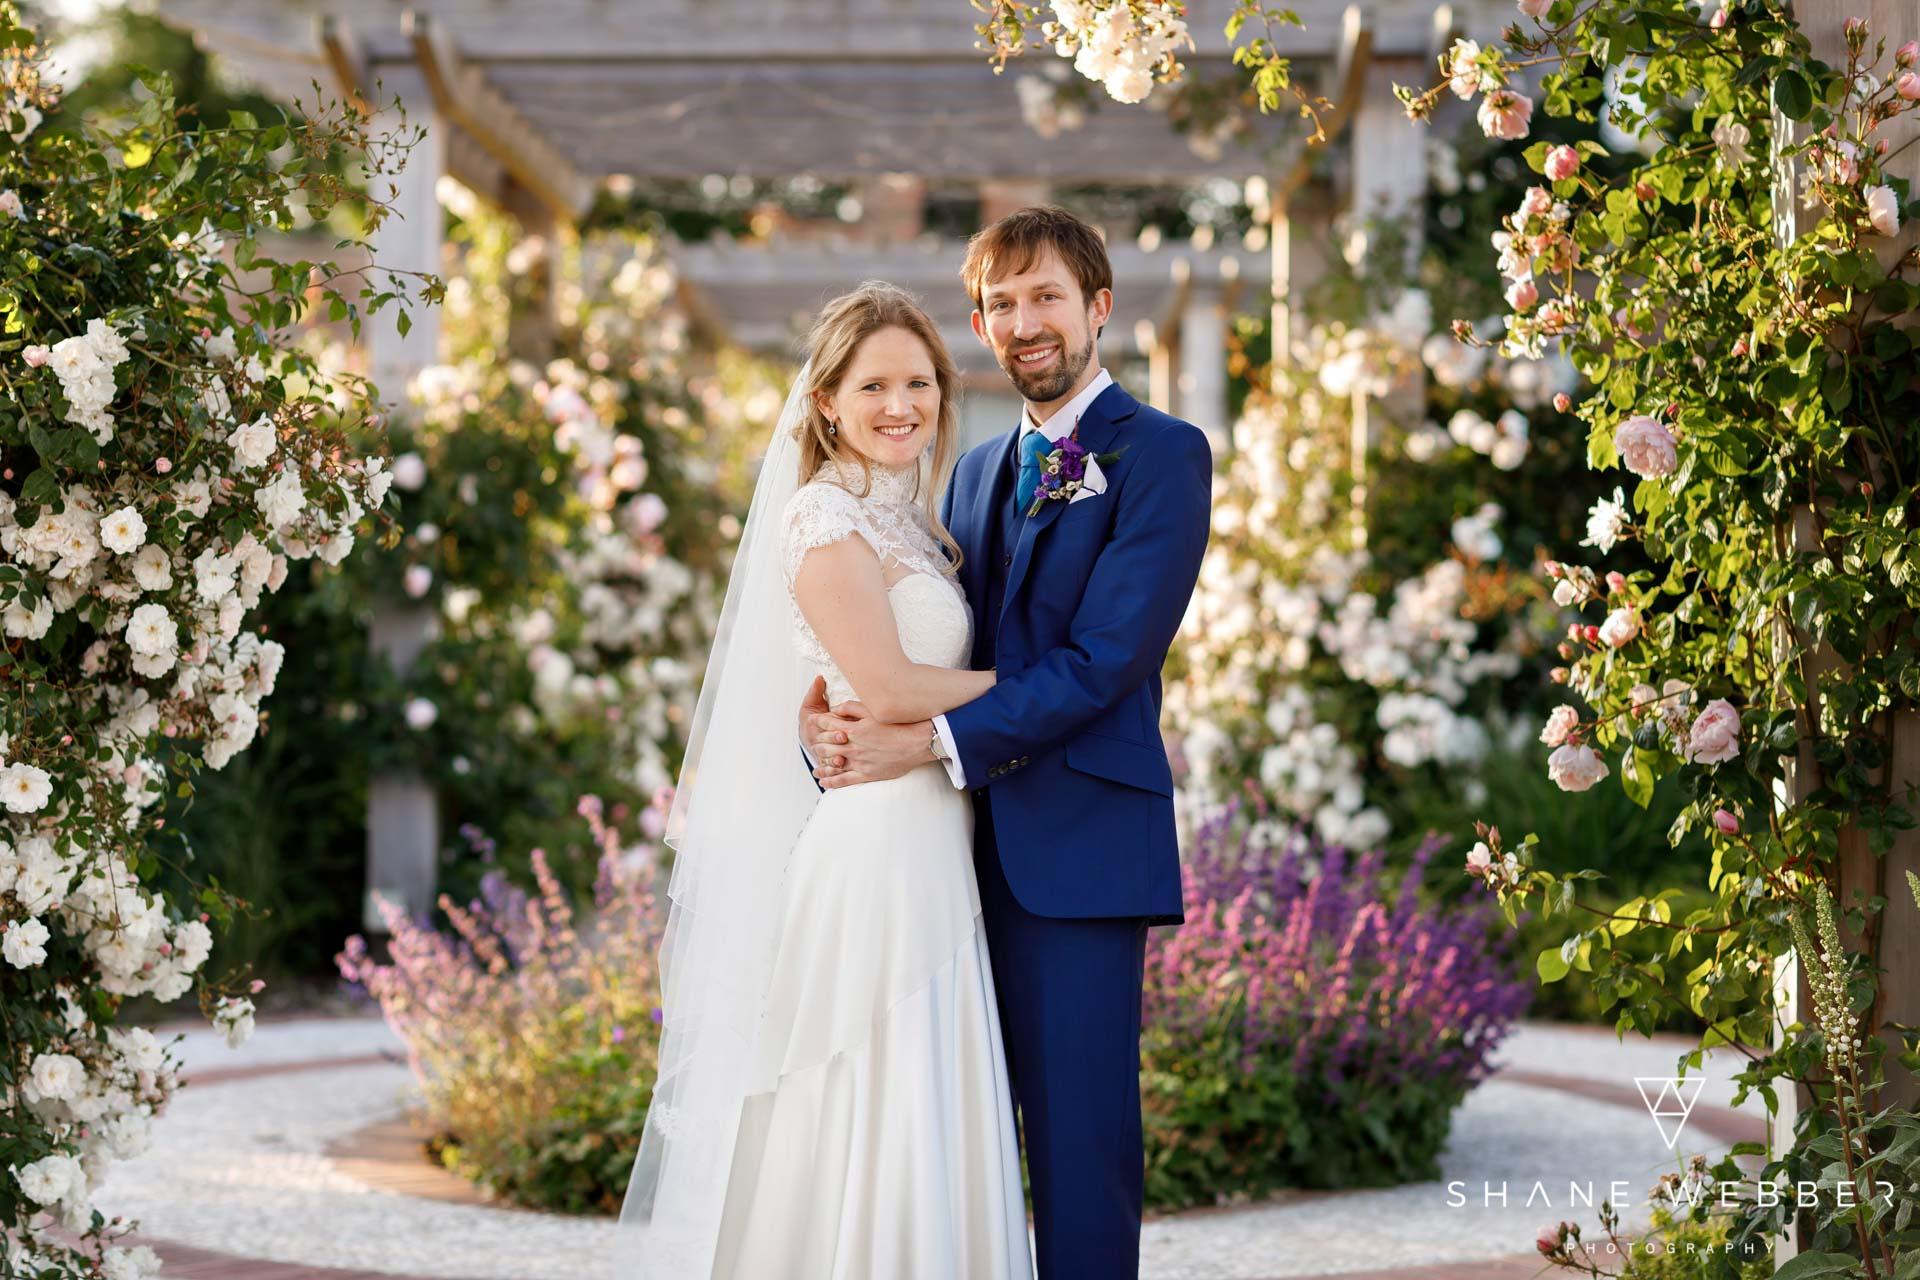 Top Manchester wedding planner